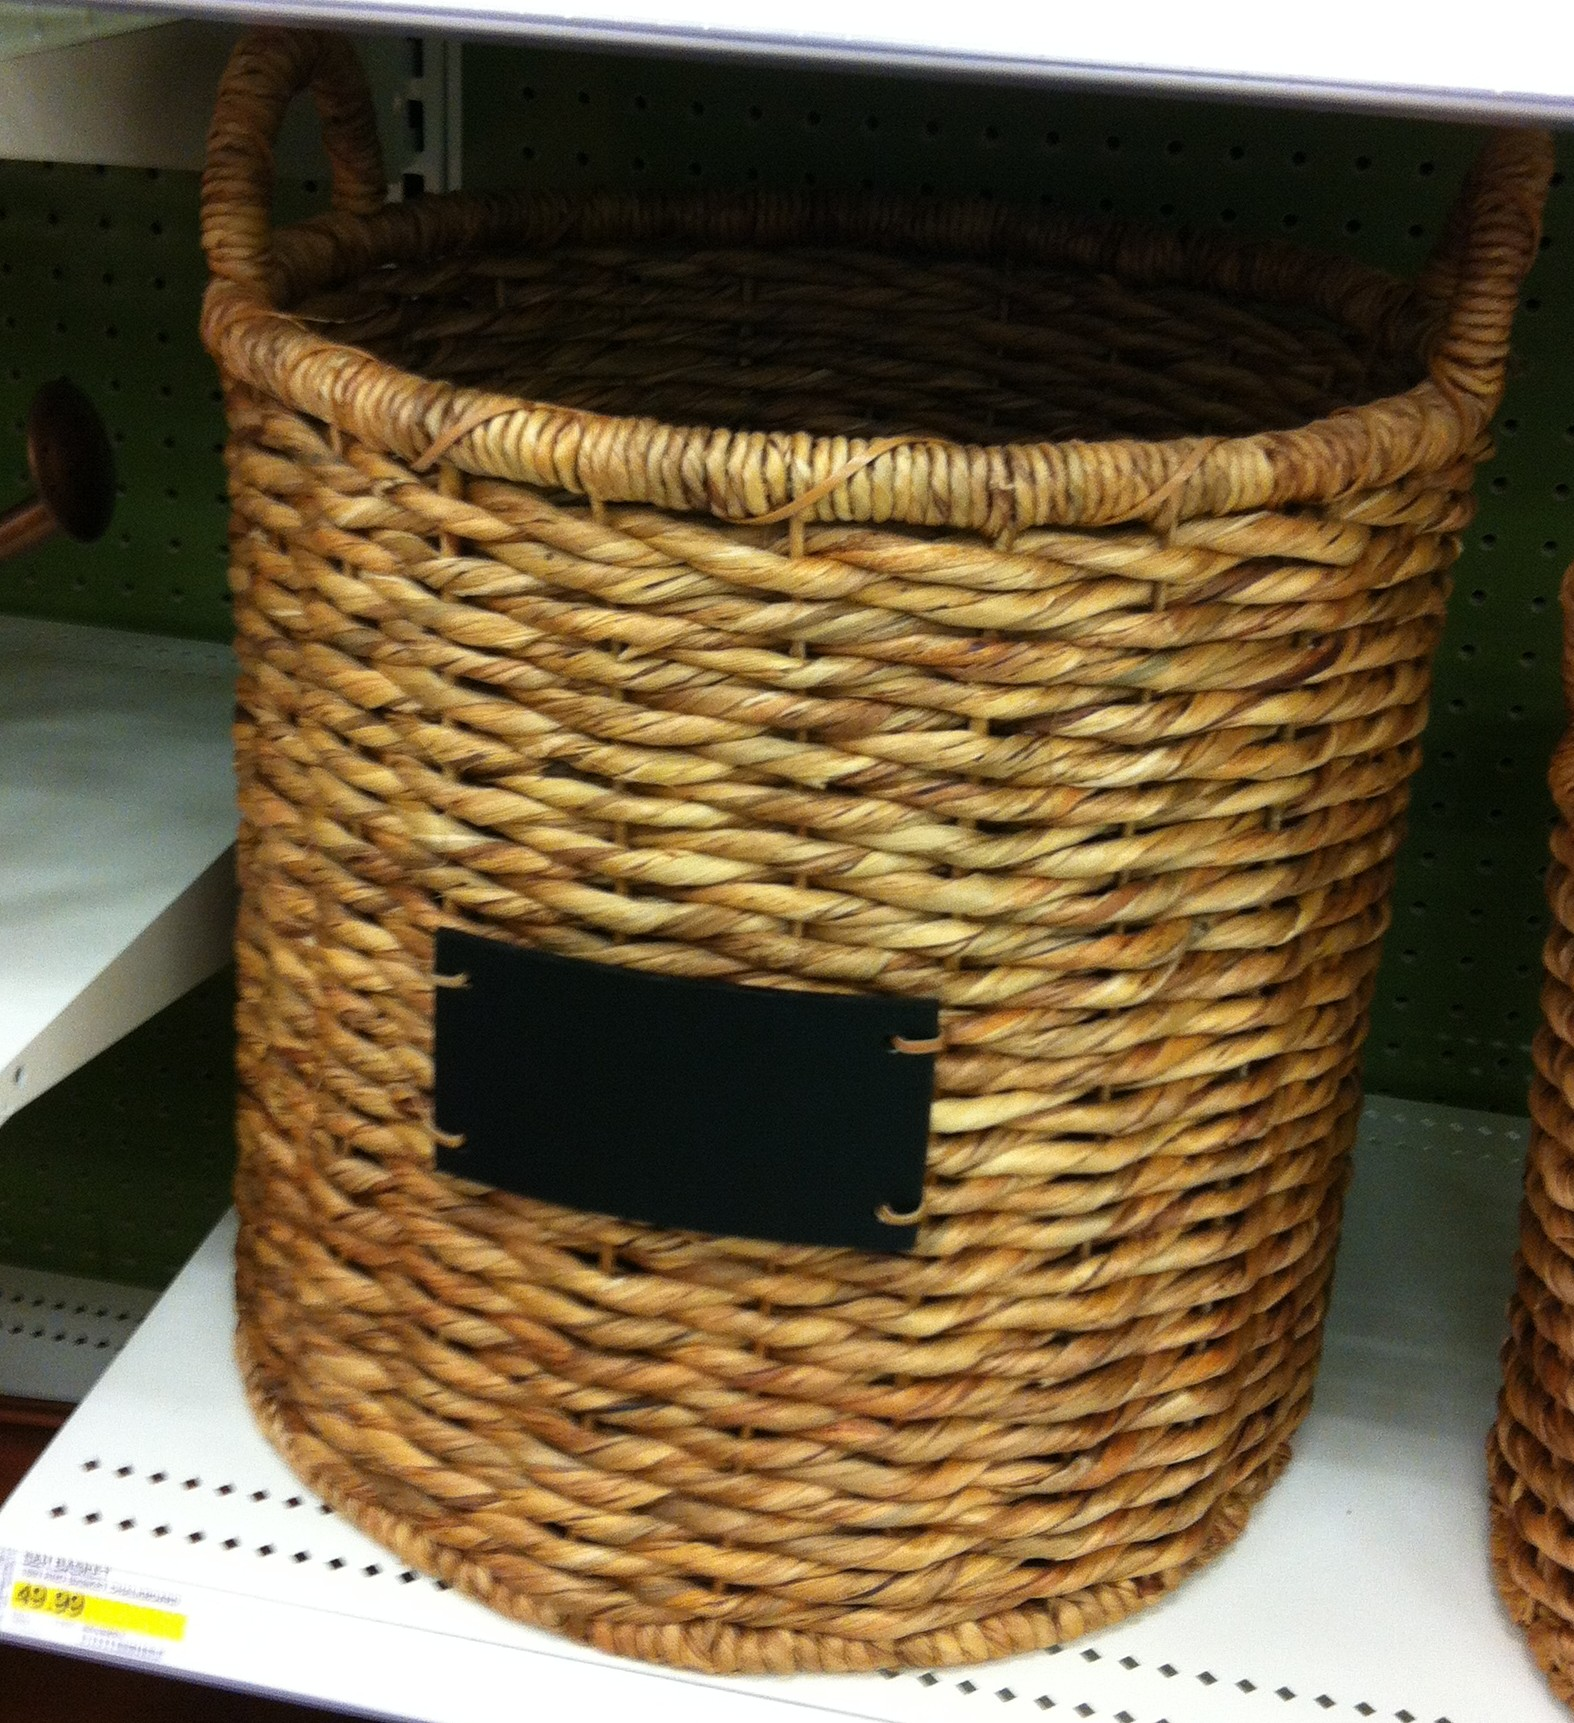 target basket with chalkboard